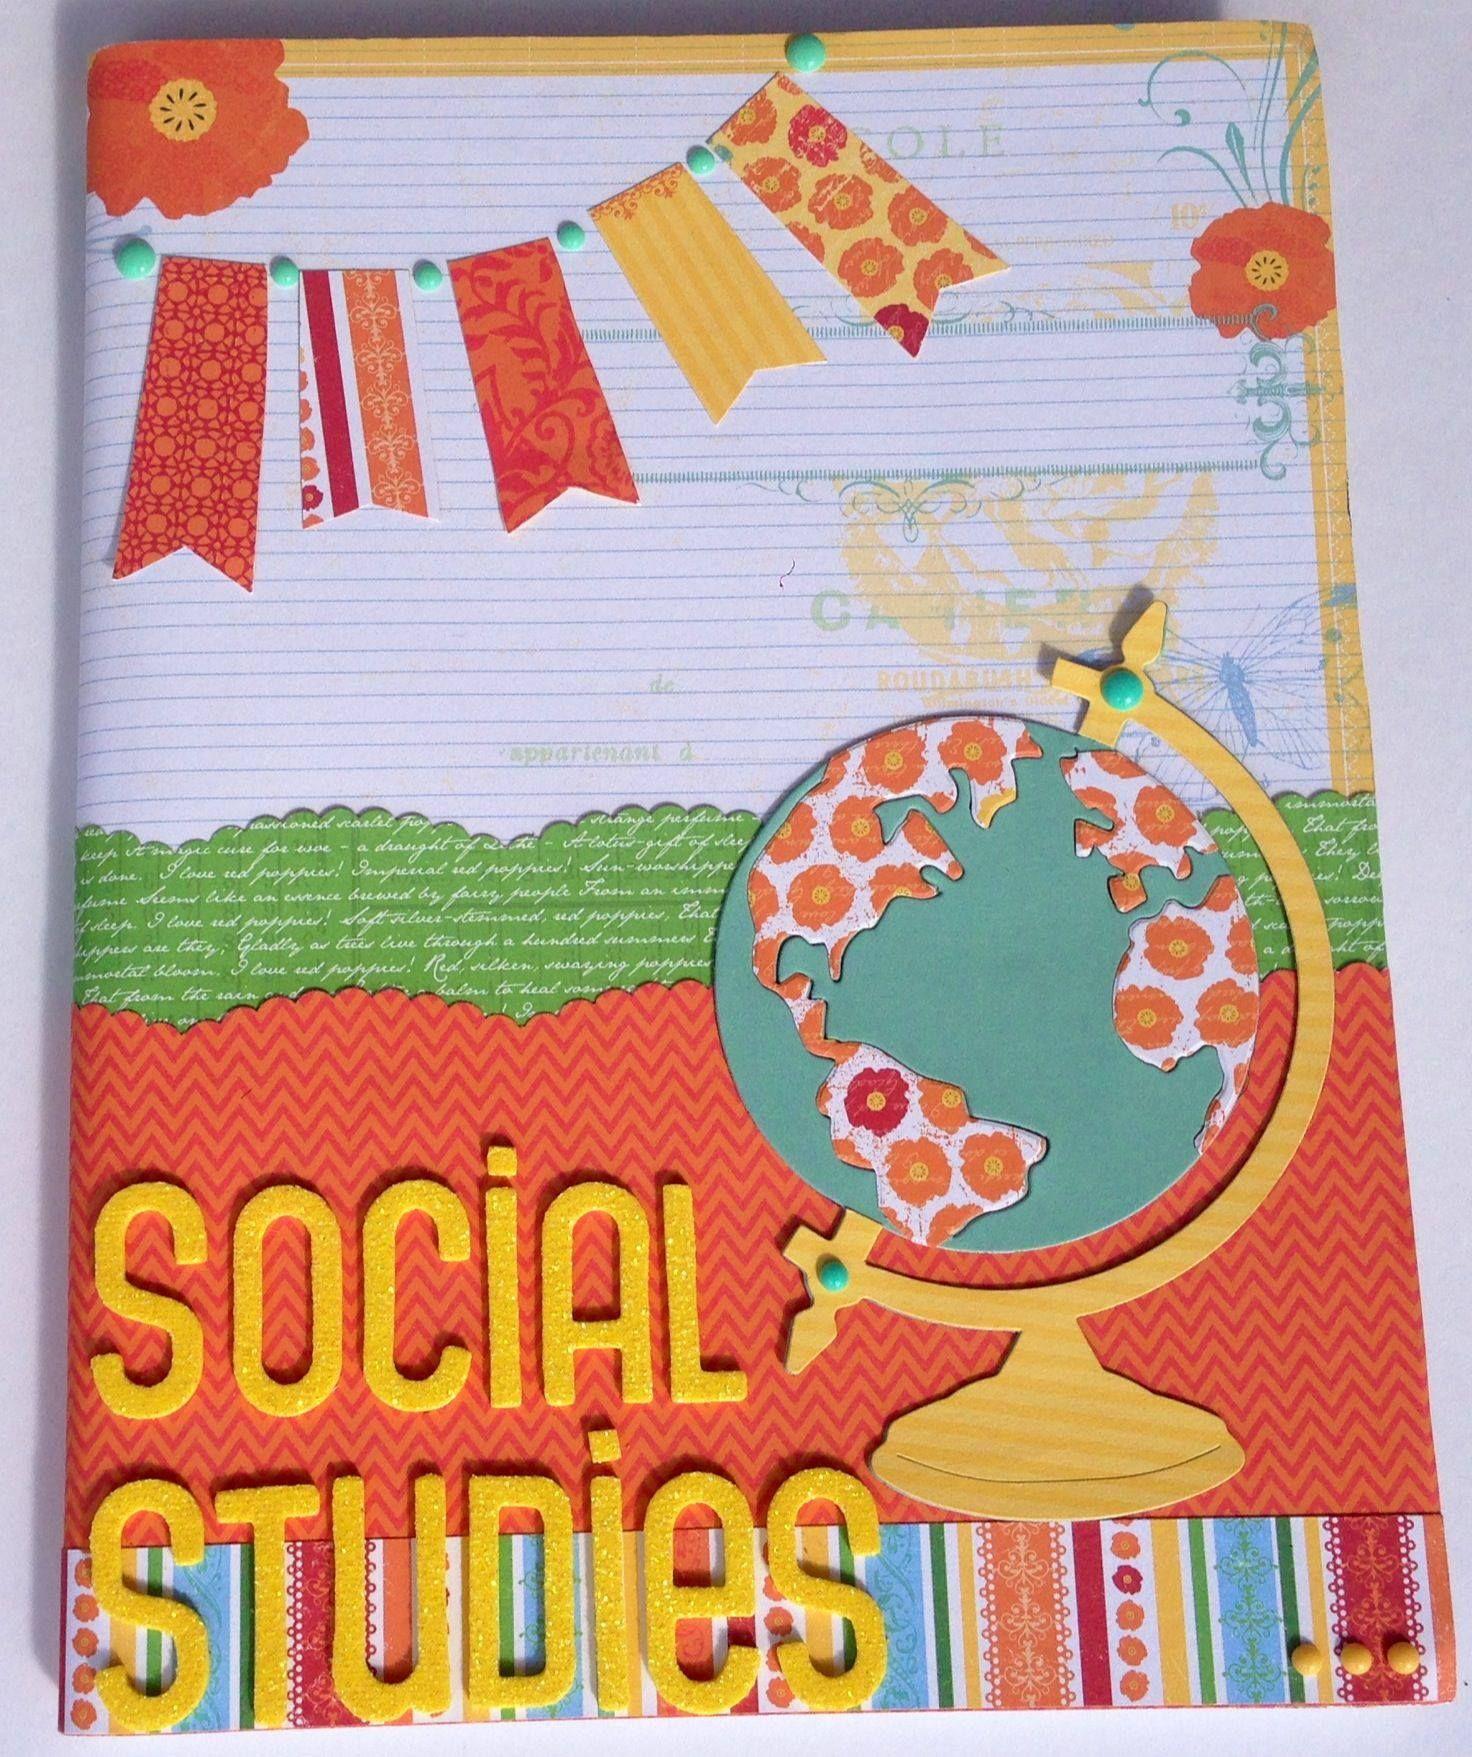 Notebook Idea Social Stu s By The Scrapbook Store